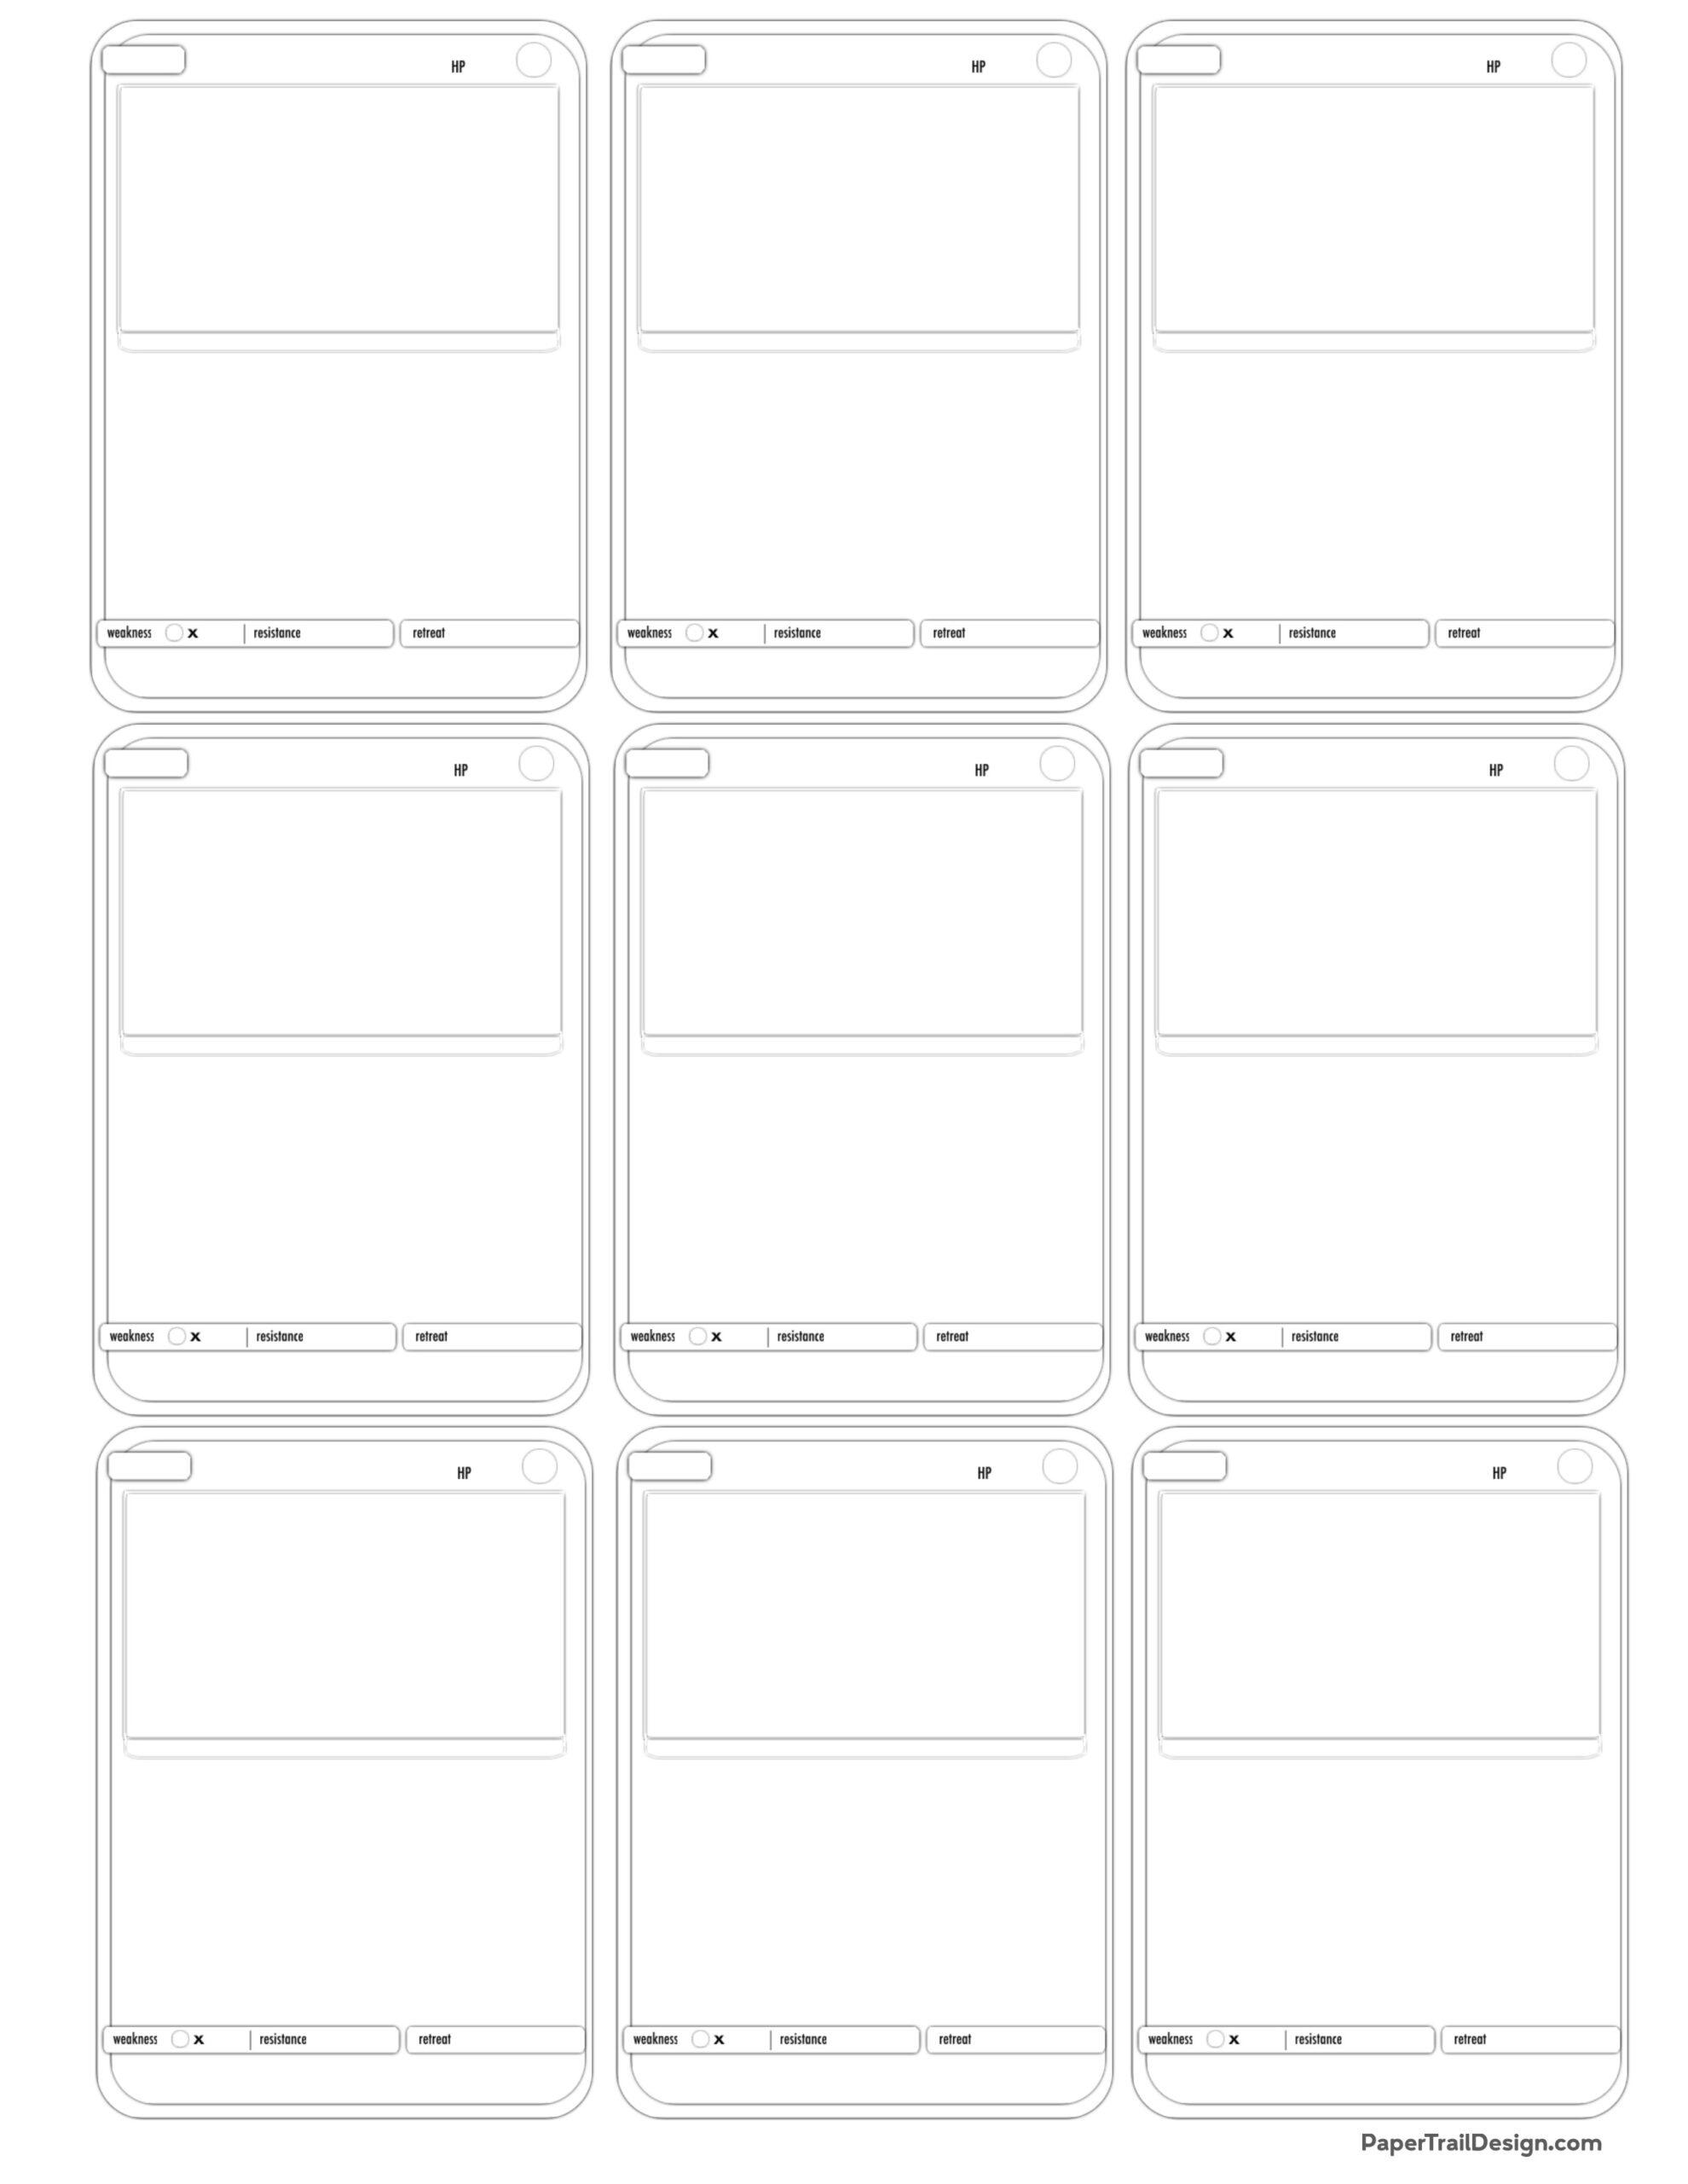 Pokemon Card Template Free Printable Paper Trail Design